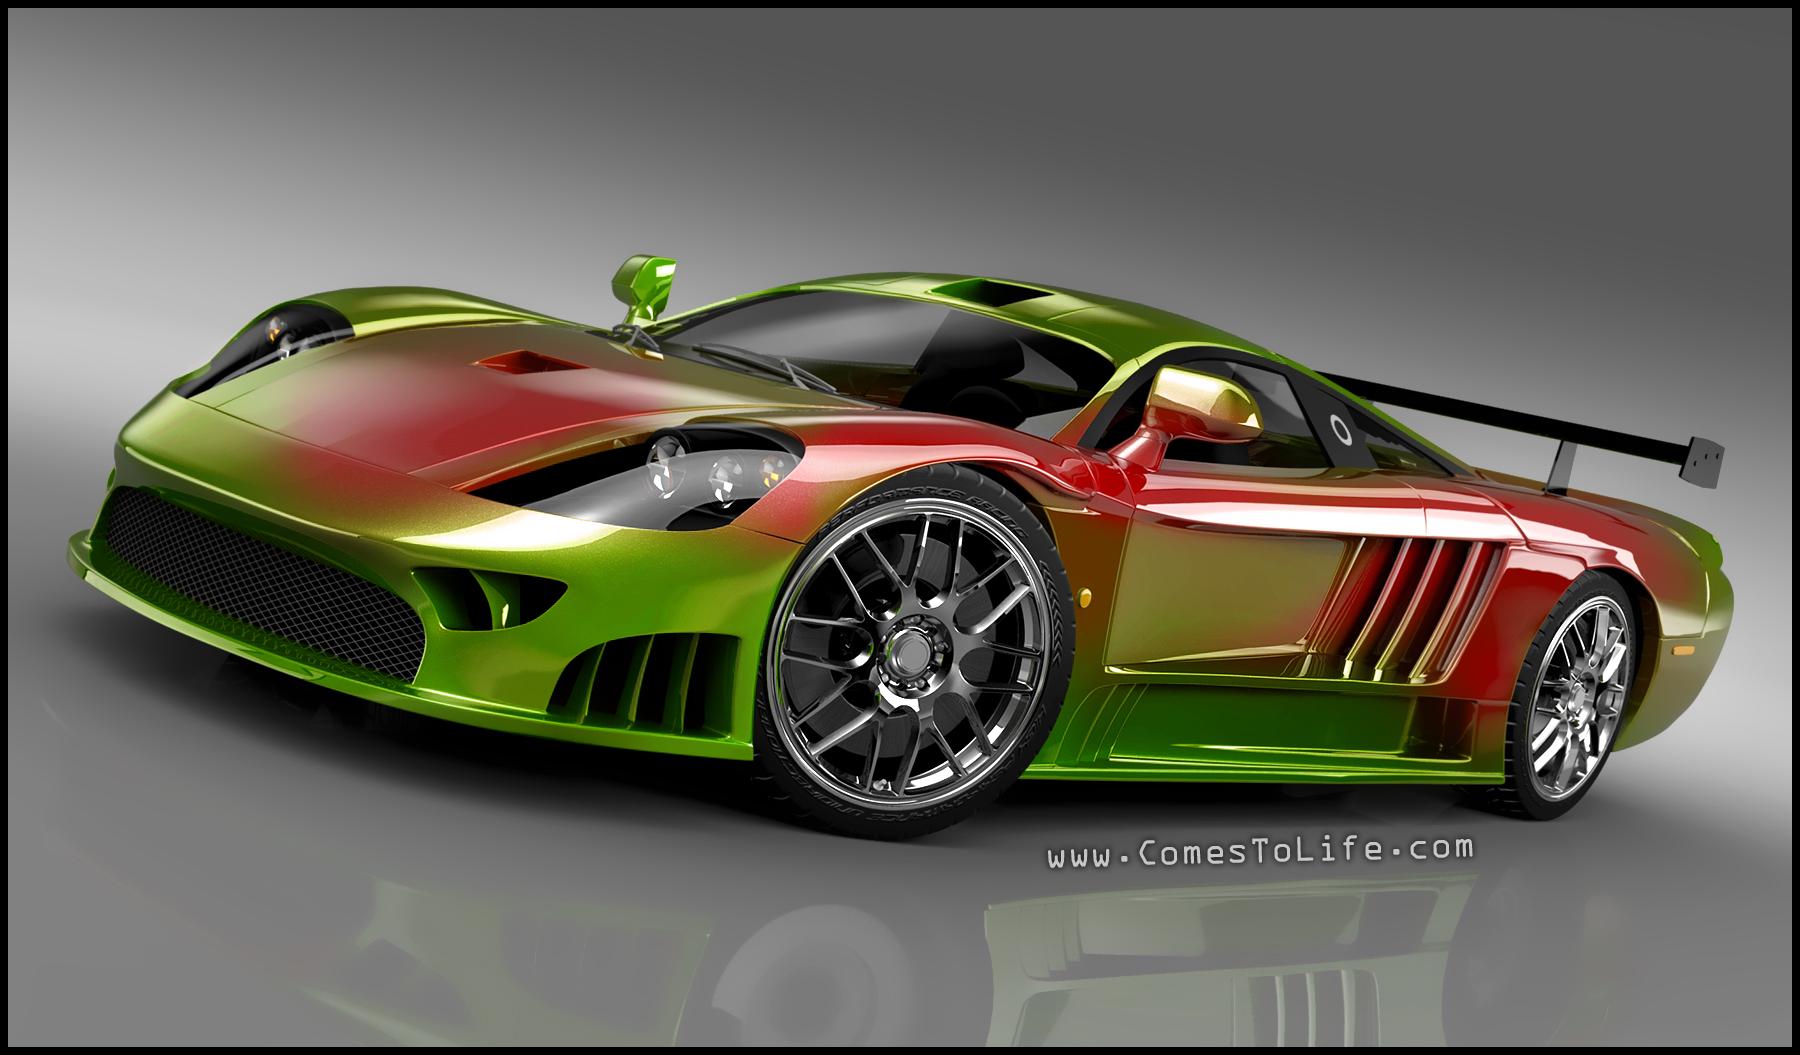 s7_green_ComesToLifeCom.jpg